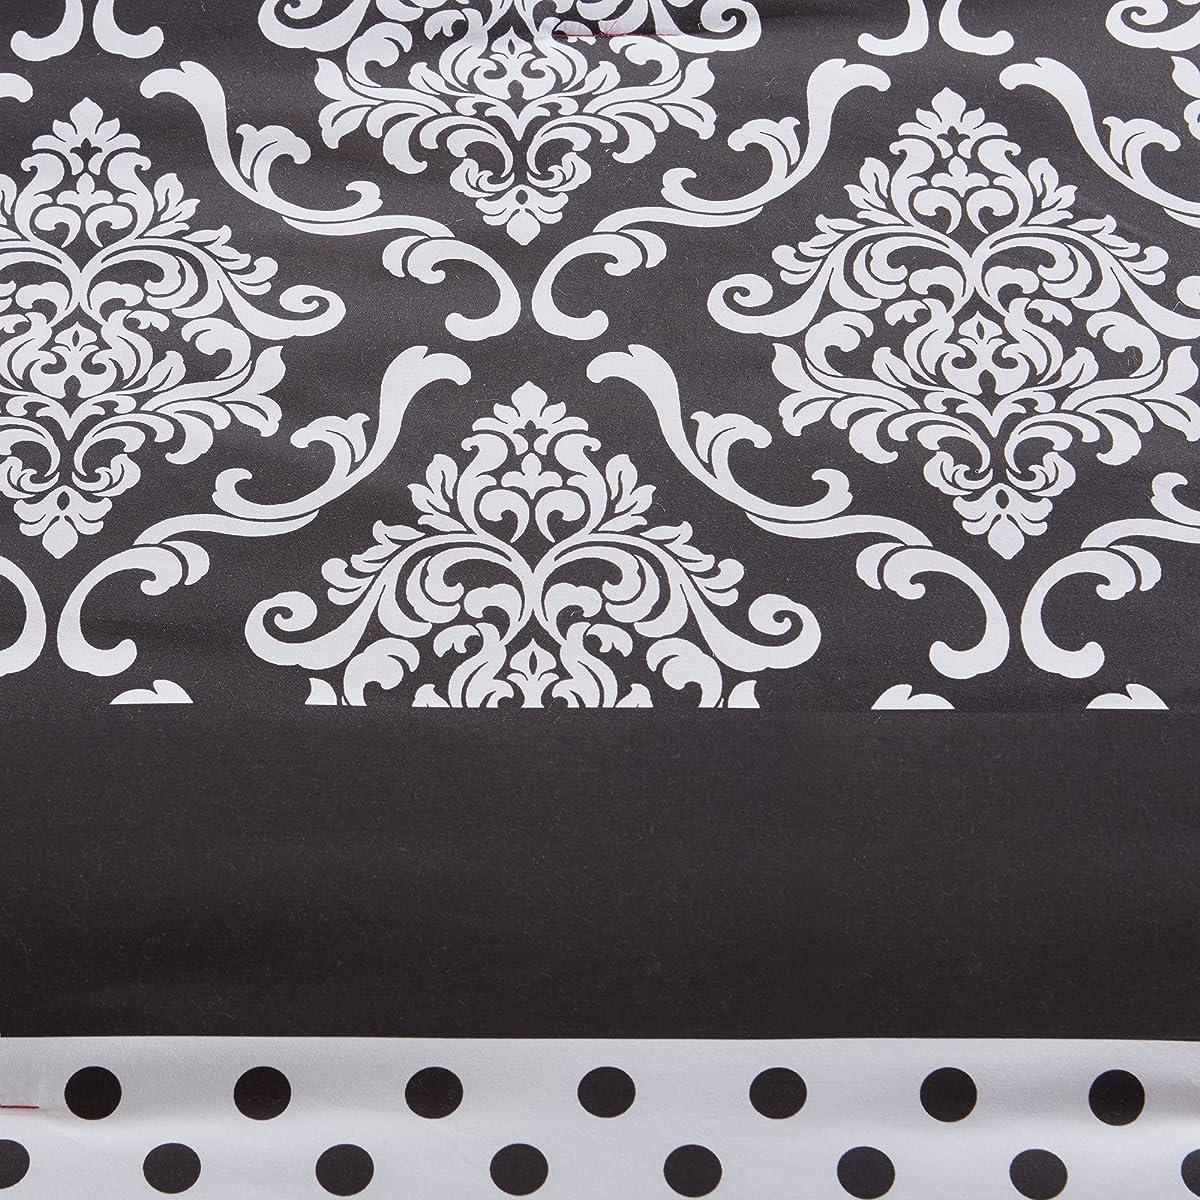 Comfort Spaces - Sally Comforter Set - 4 Piece - Hot Pink & Black - Zebra, Damask, Polka dot print - Queen Size, includes 1 Comforter, 2 Shams, 1 Decorative Pillow